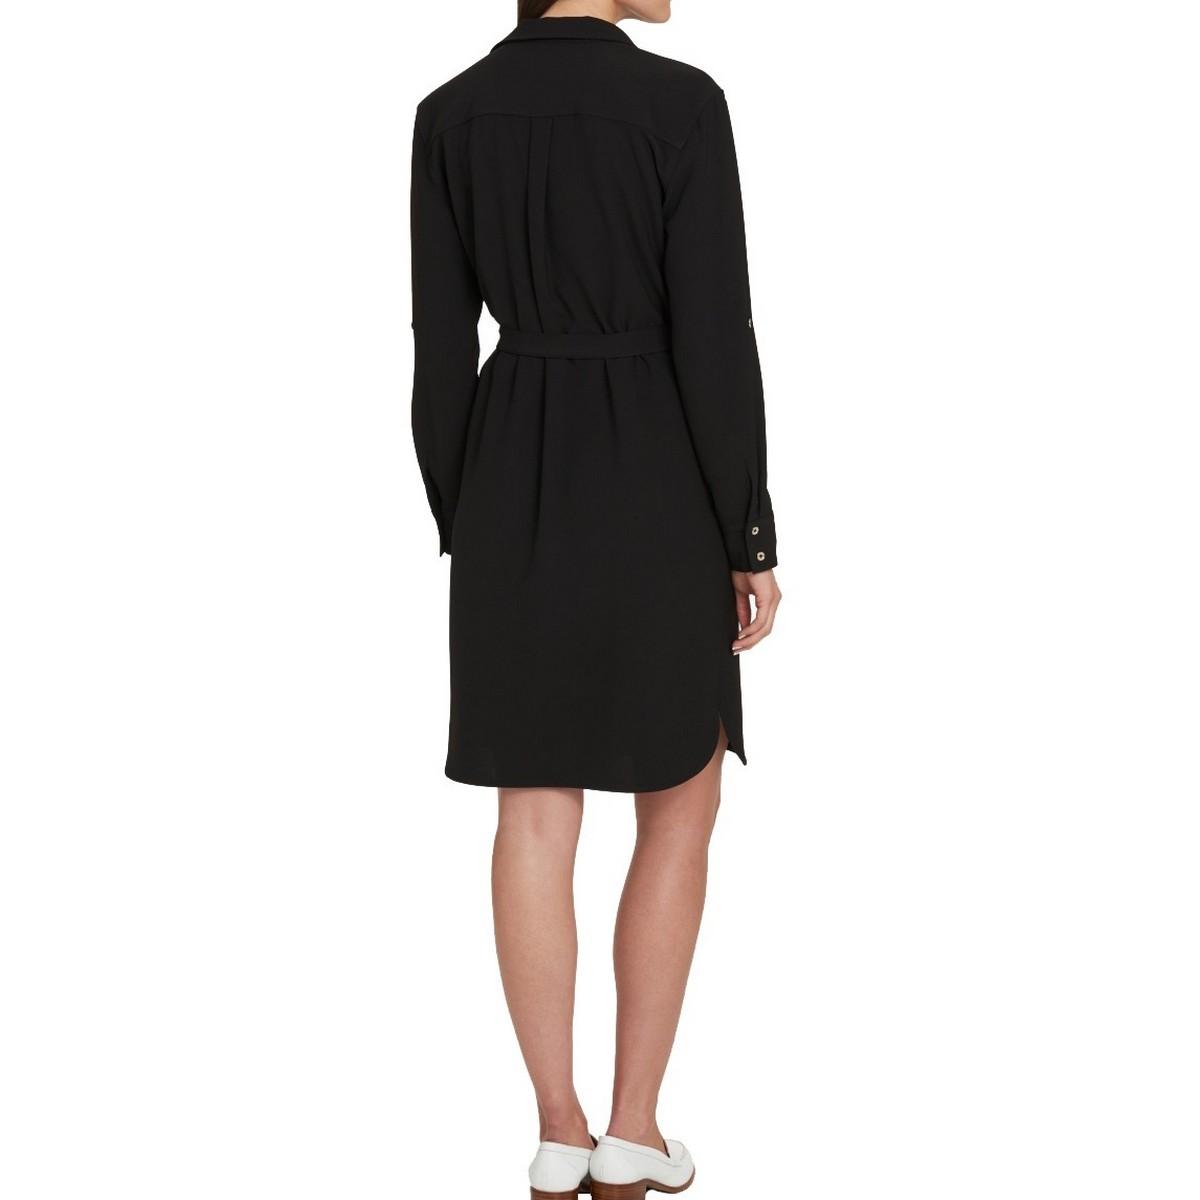 TOMMY HILFIGER NEW Women/'s Collared Button Down Shirt Dress TEDO